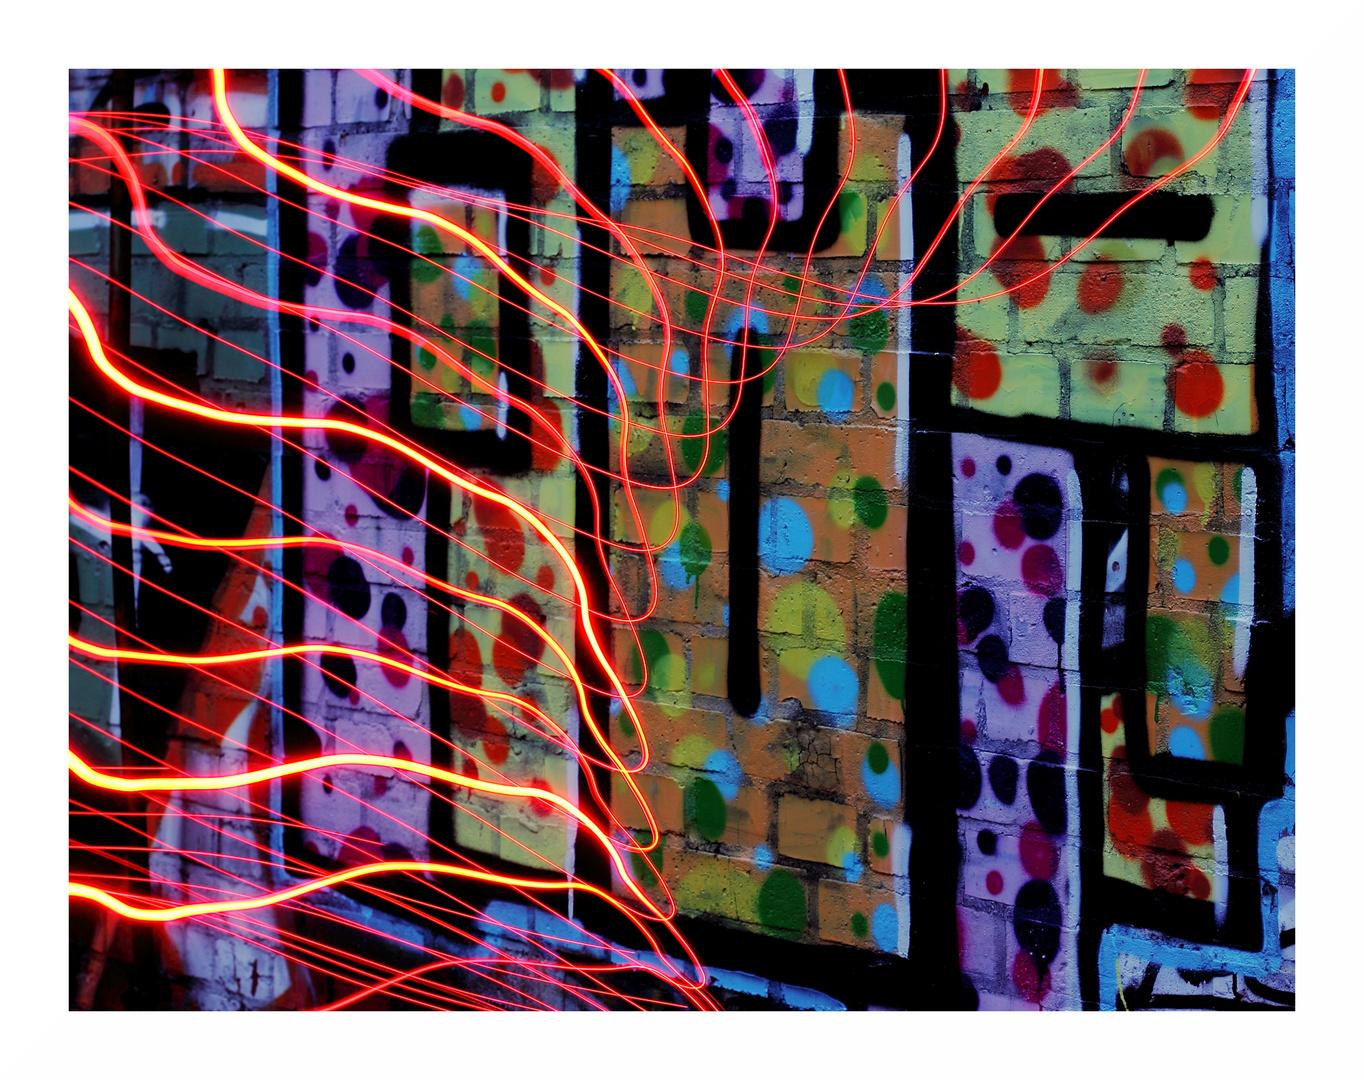 LAPADU mit LEDs und Graffiti...